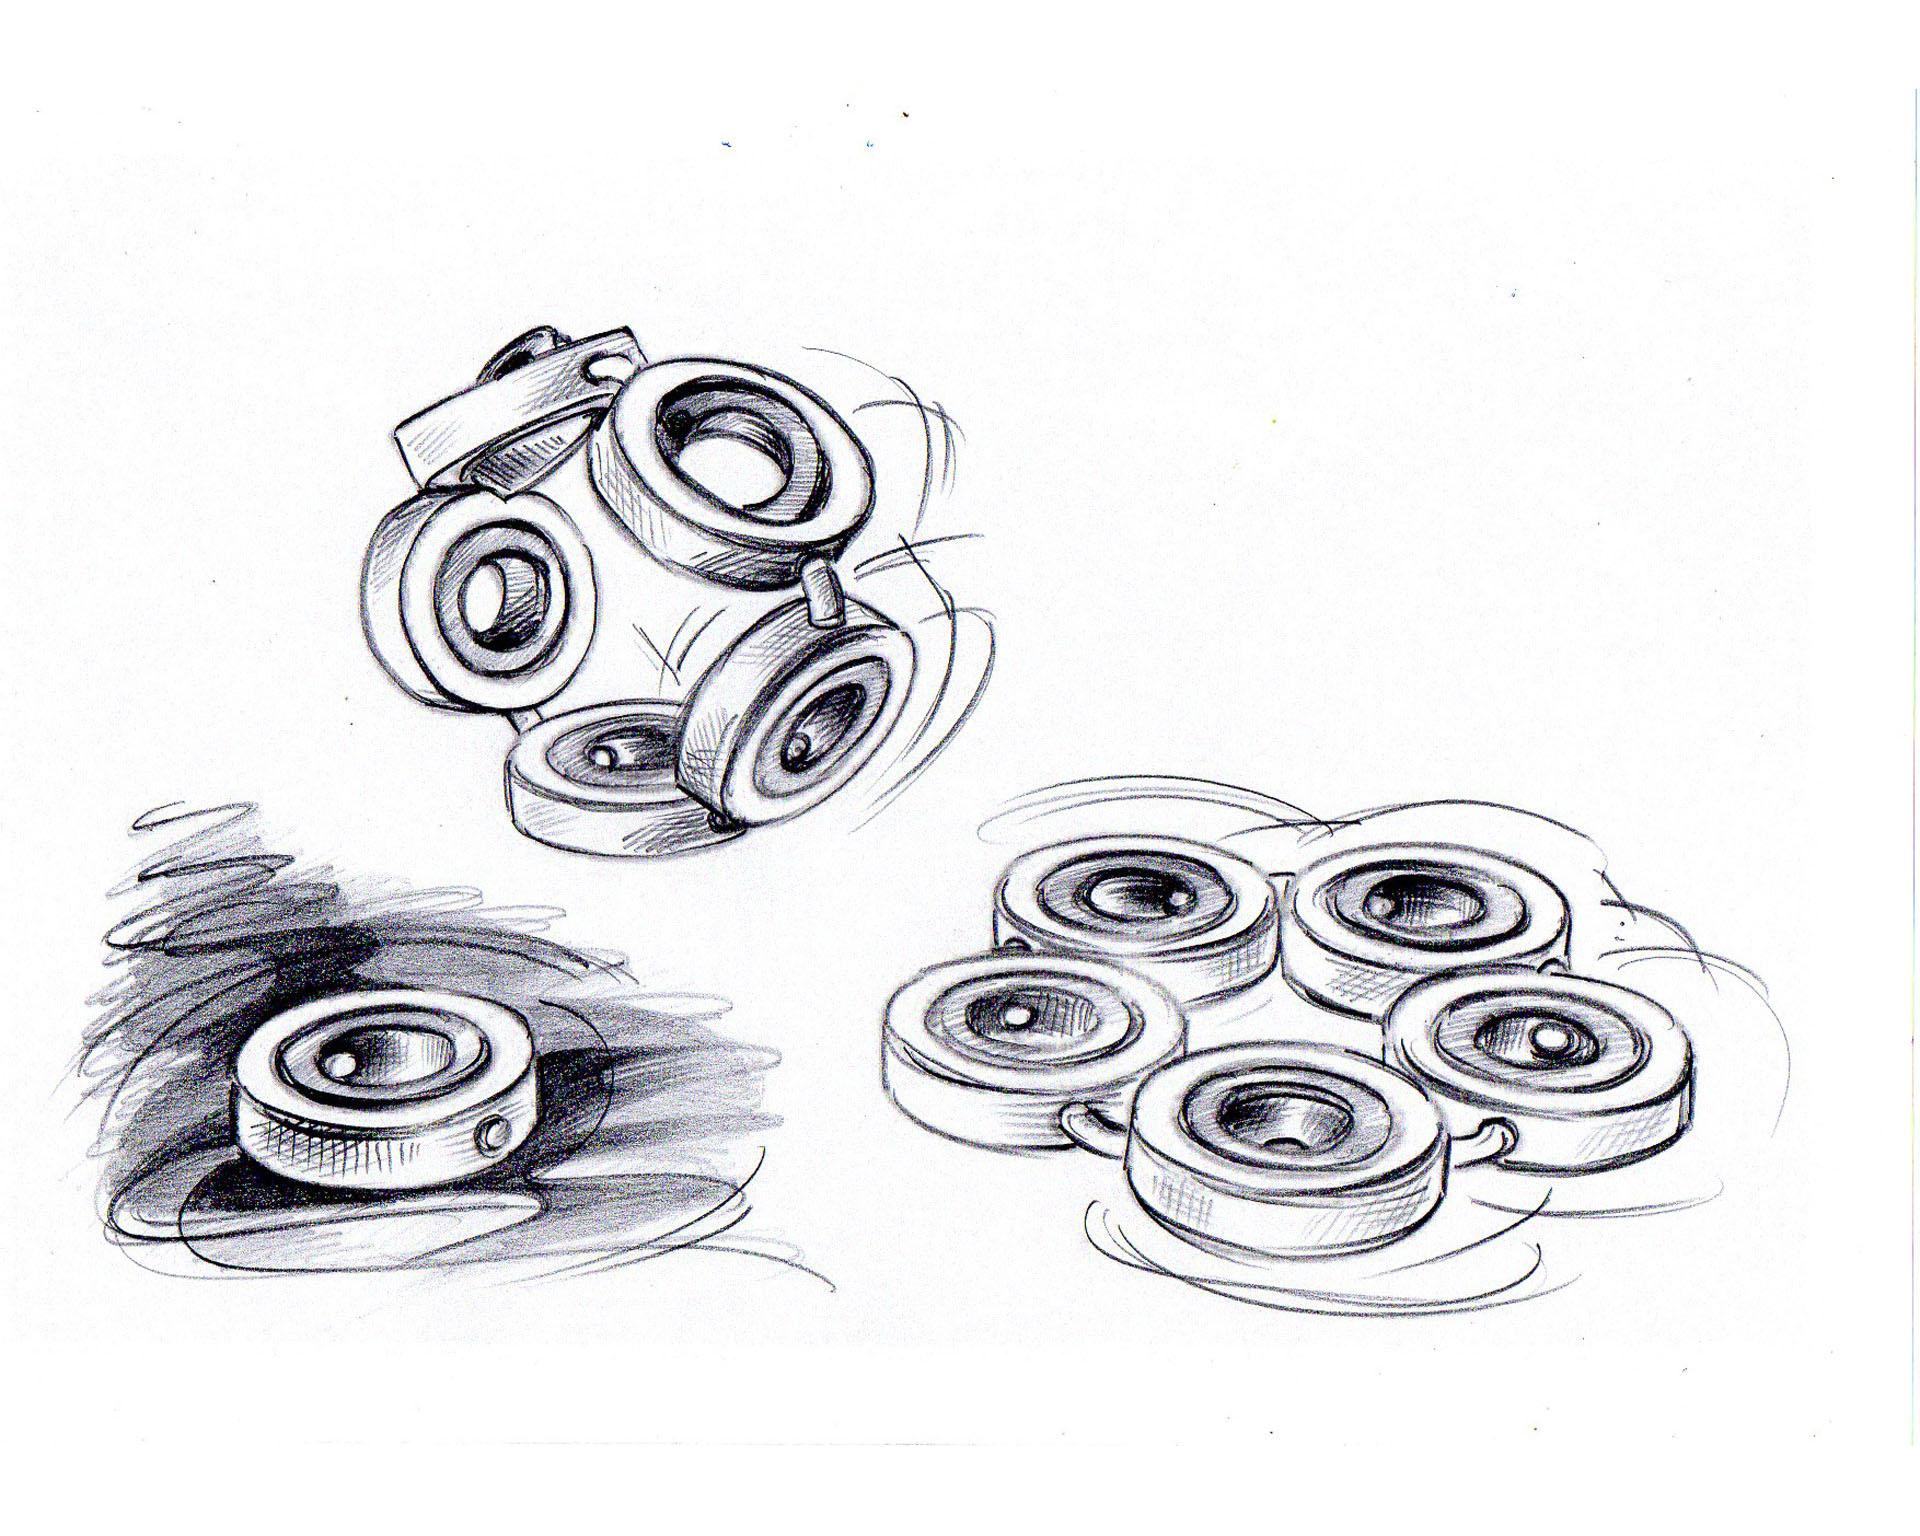 Cerchio nel cerchio